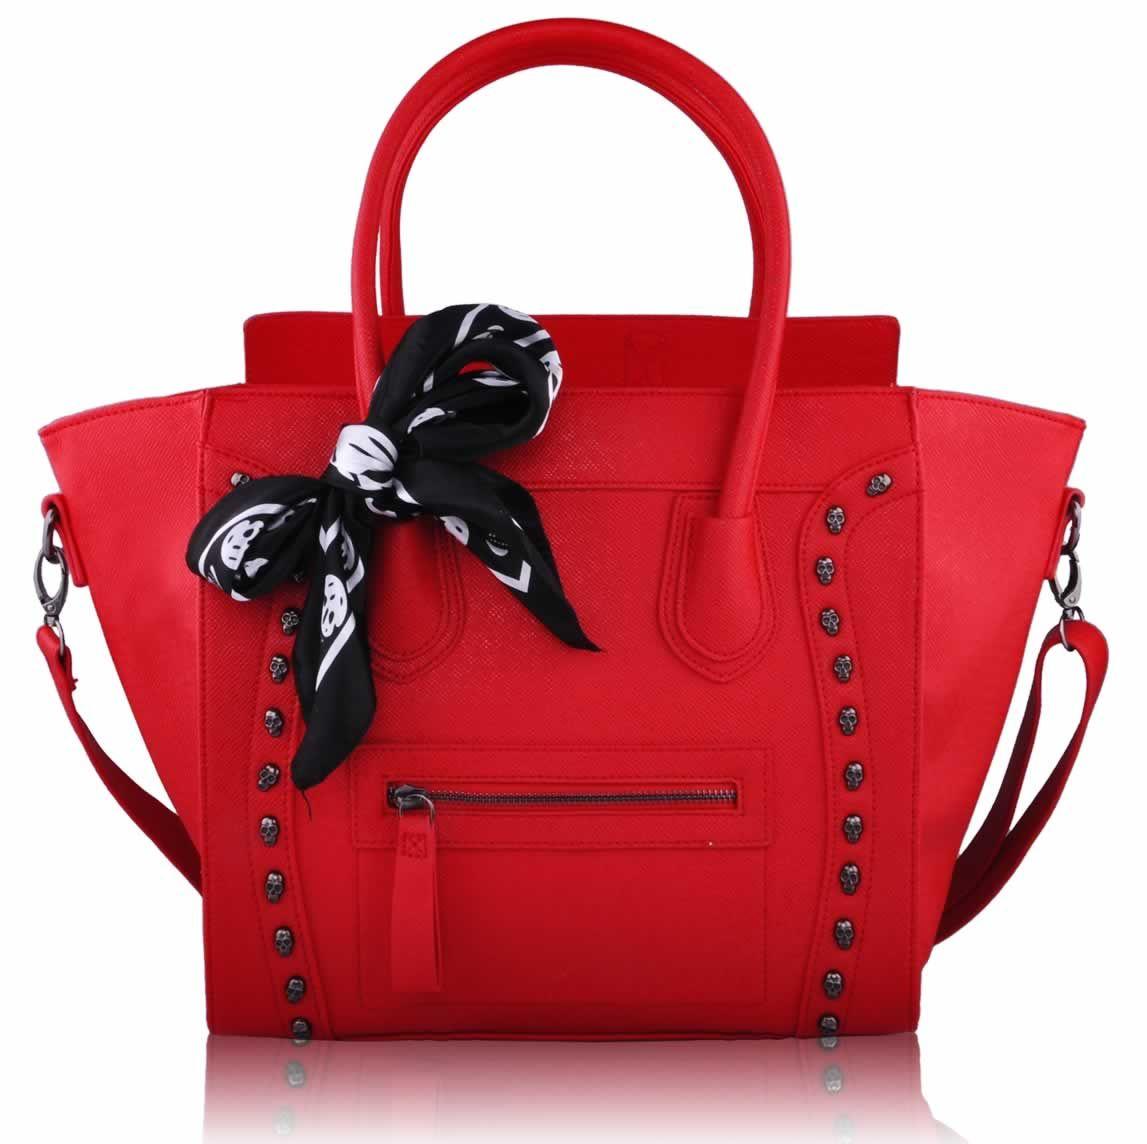 L00143S.BOSTON SMILE STYLE SKULL PRINT BAG | Wholesale Fashion ...